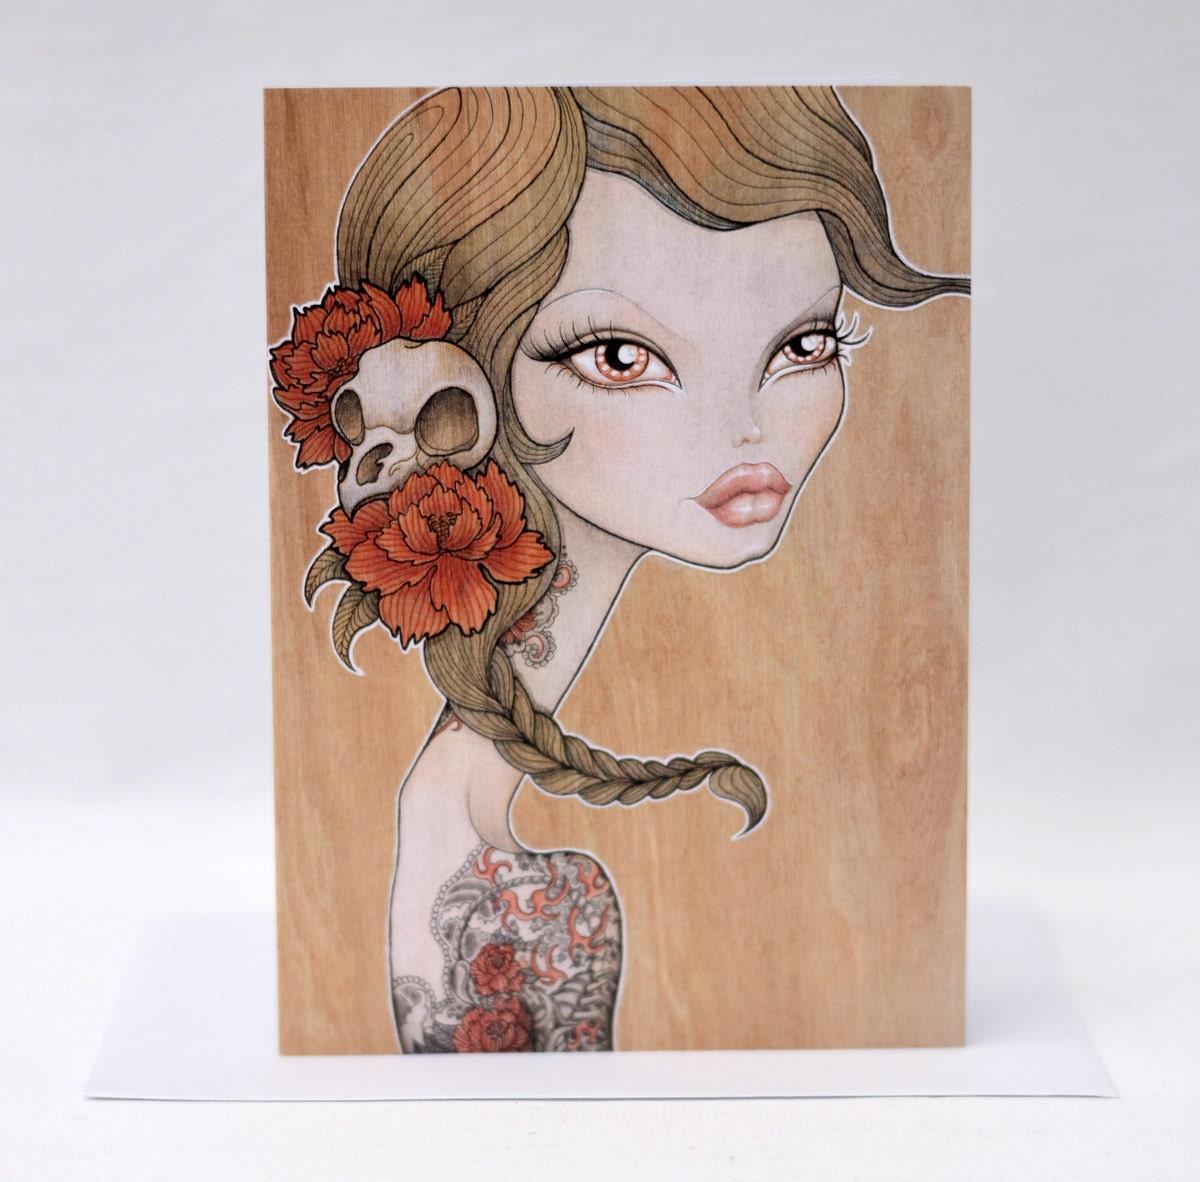 Giclee print of my original illustration beautiful tattooed woman portrait with peonies /'Rosamund/'